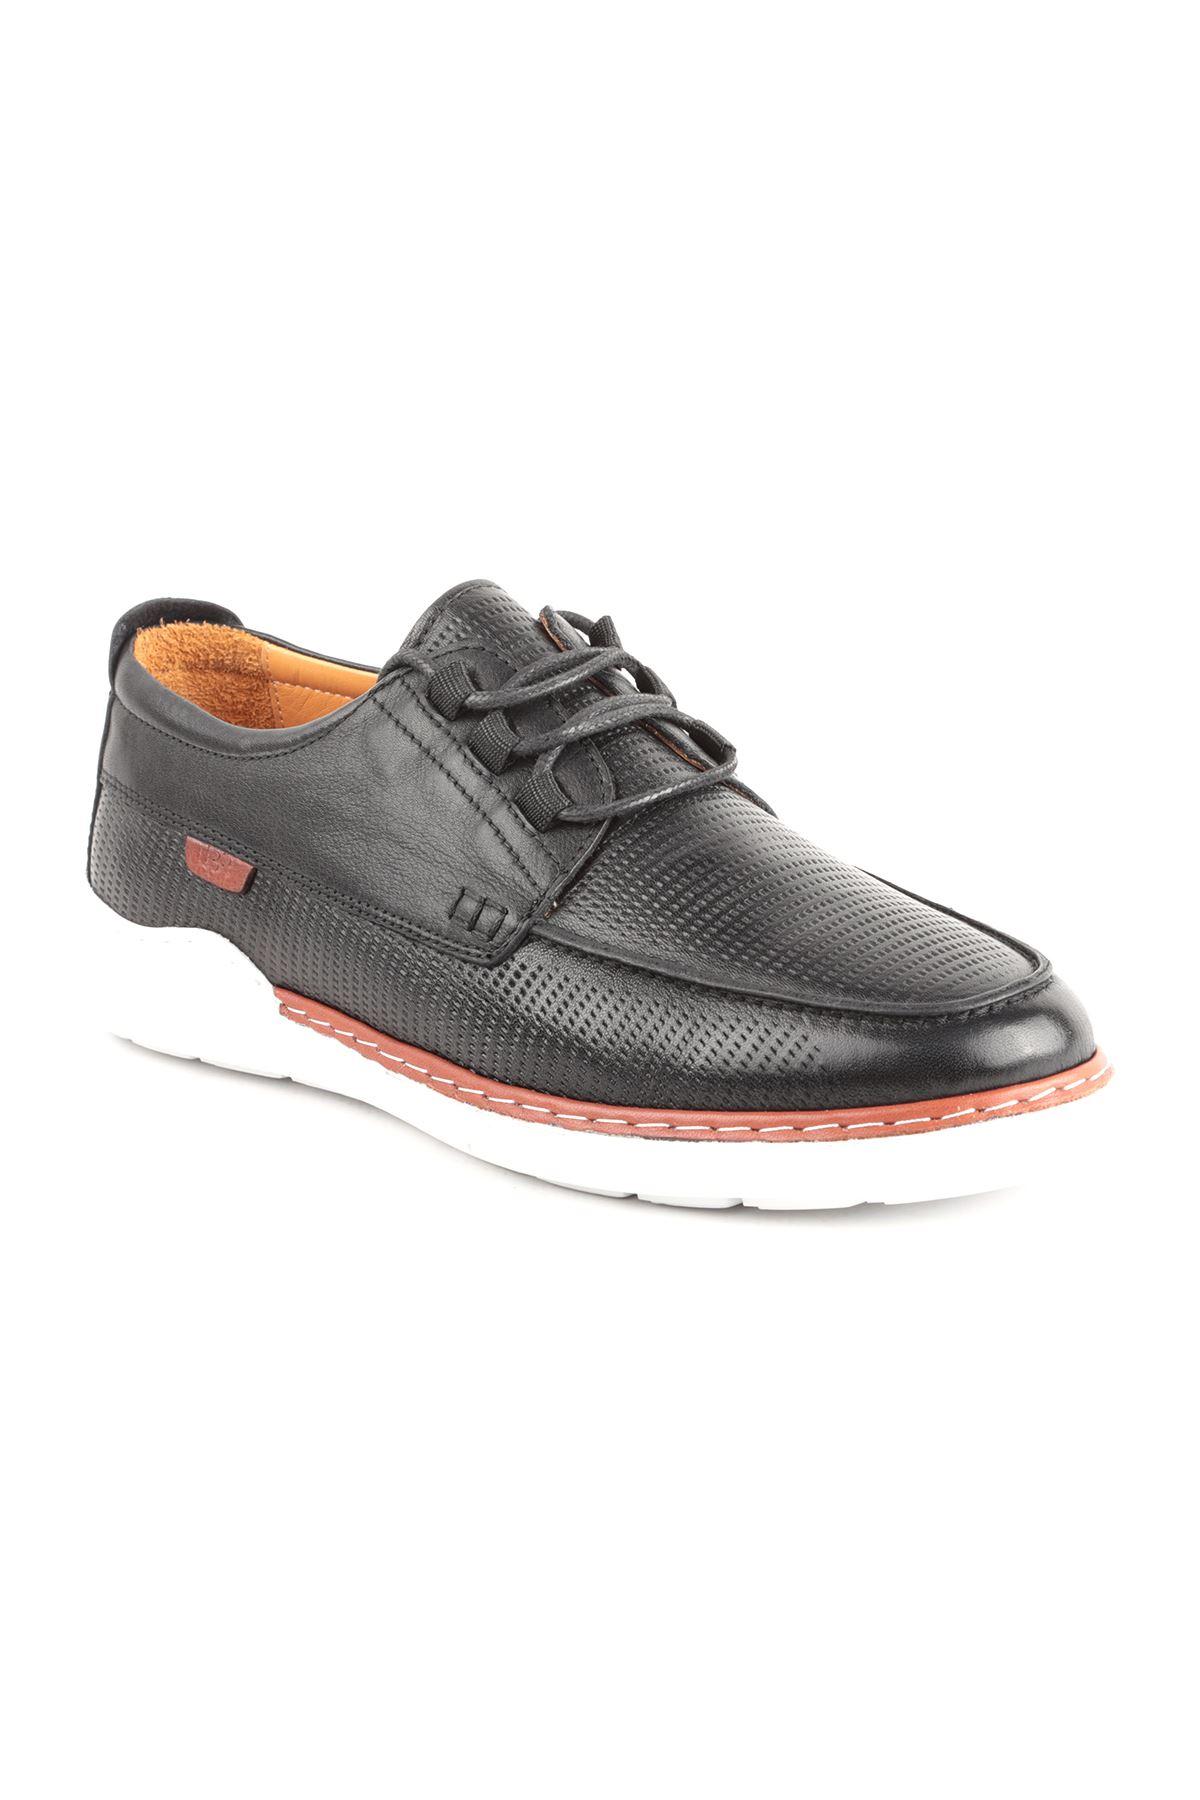 Libero L3629 Siyah Loafer Ayakkabı